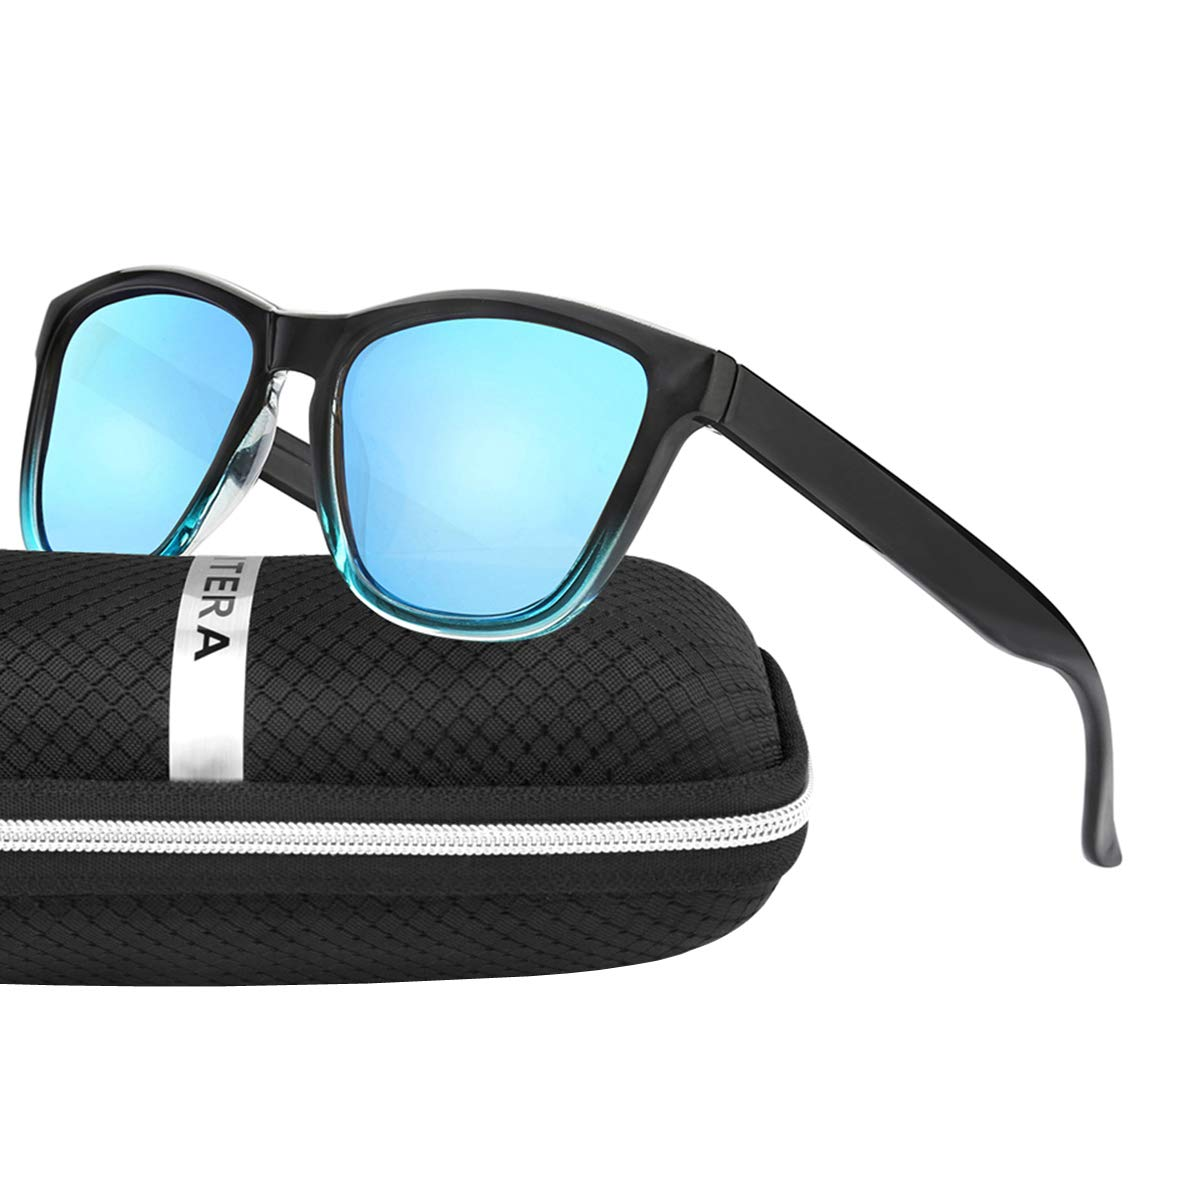 ELITERA Women Sunglasses Famous Lady Designer Gradient Colors Polarized Glasses UV400 E0717 (Black&Blue, 53)